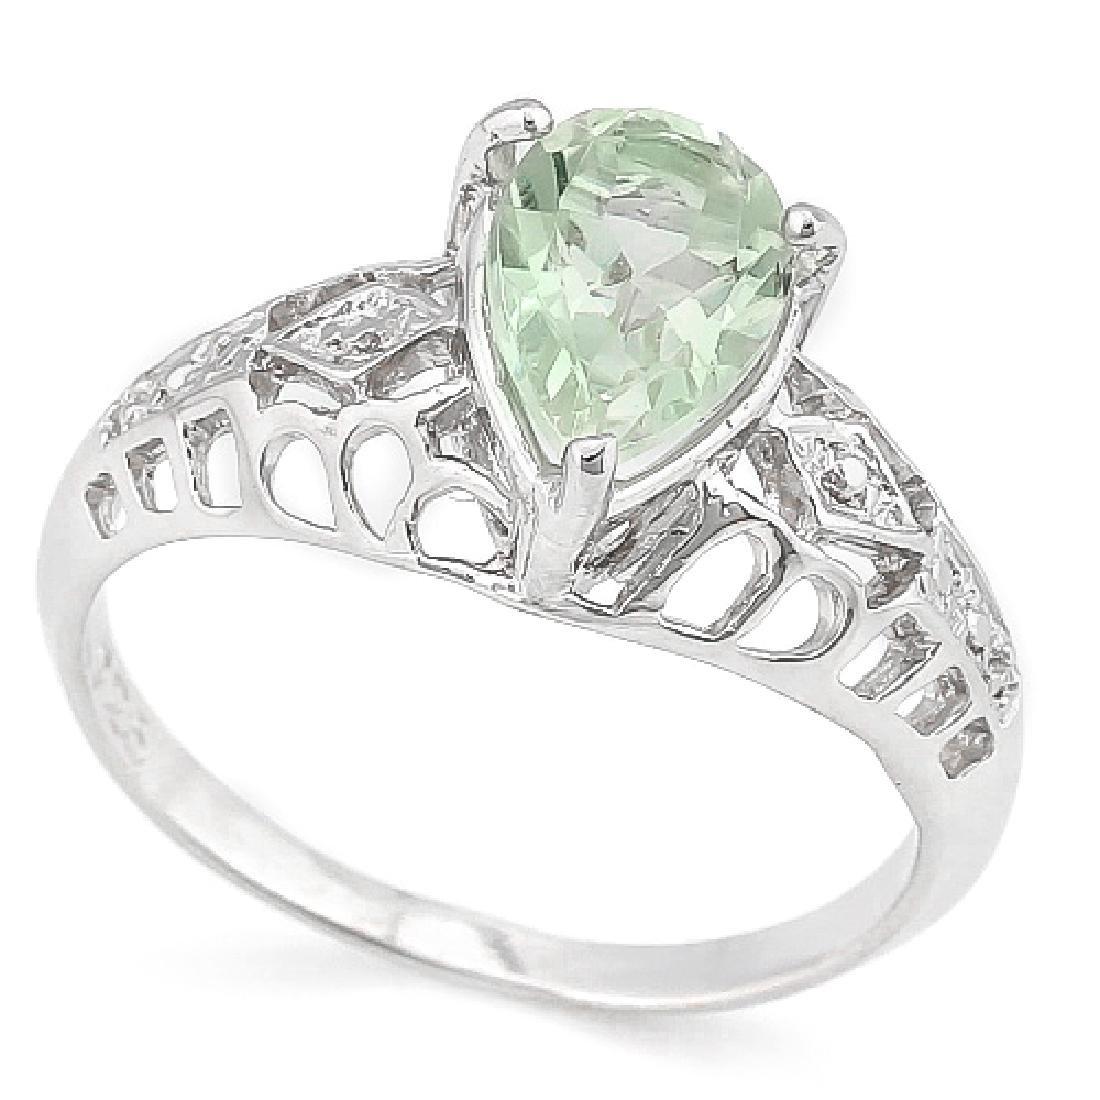 1 1/5 CARAT GREEN AMETHYST & DIAMOND 925 STERLING SILVE